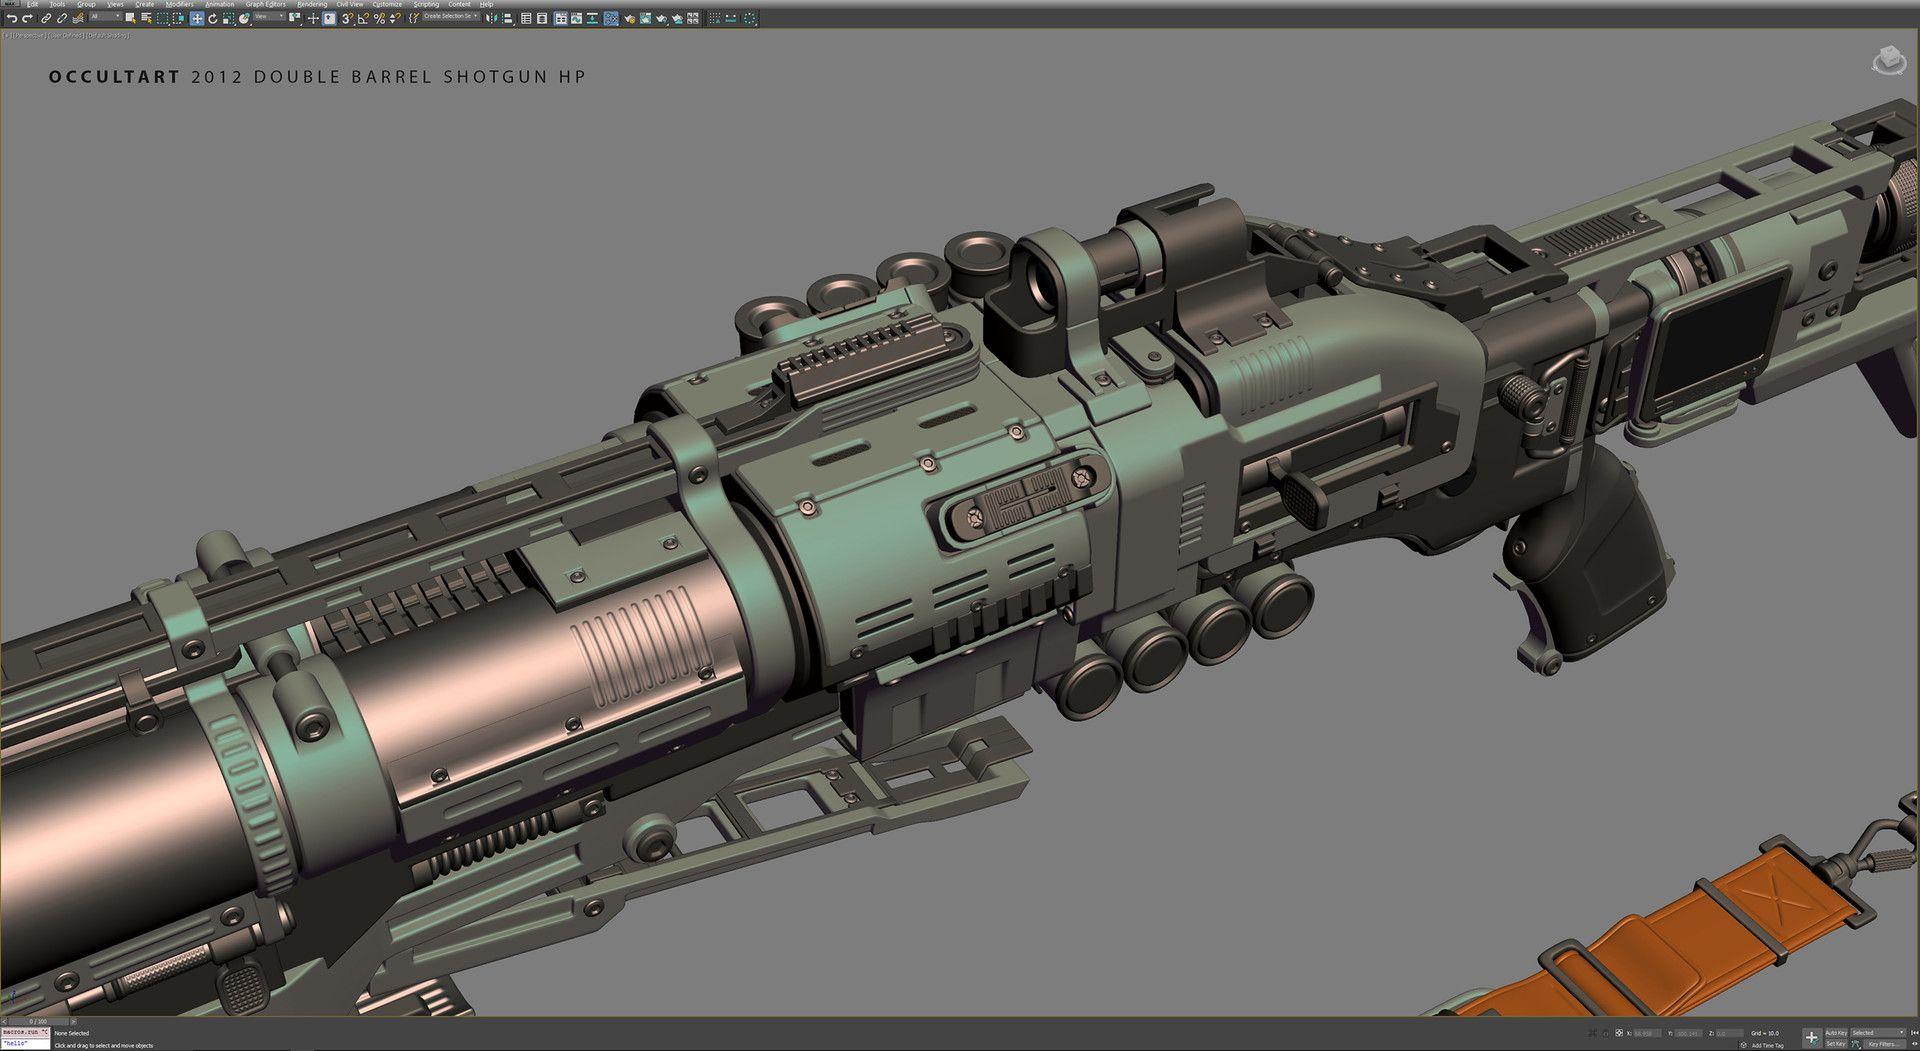 ArtStation - Double Barrel Shotgun HP, OccultArt _